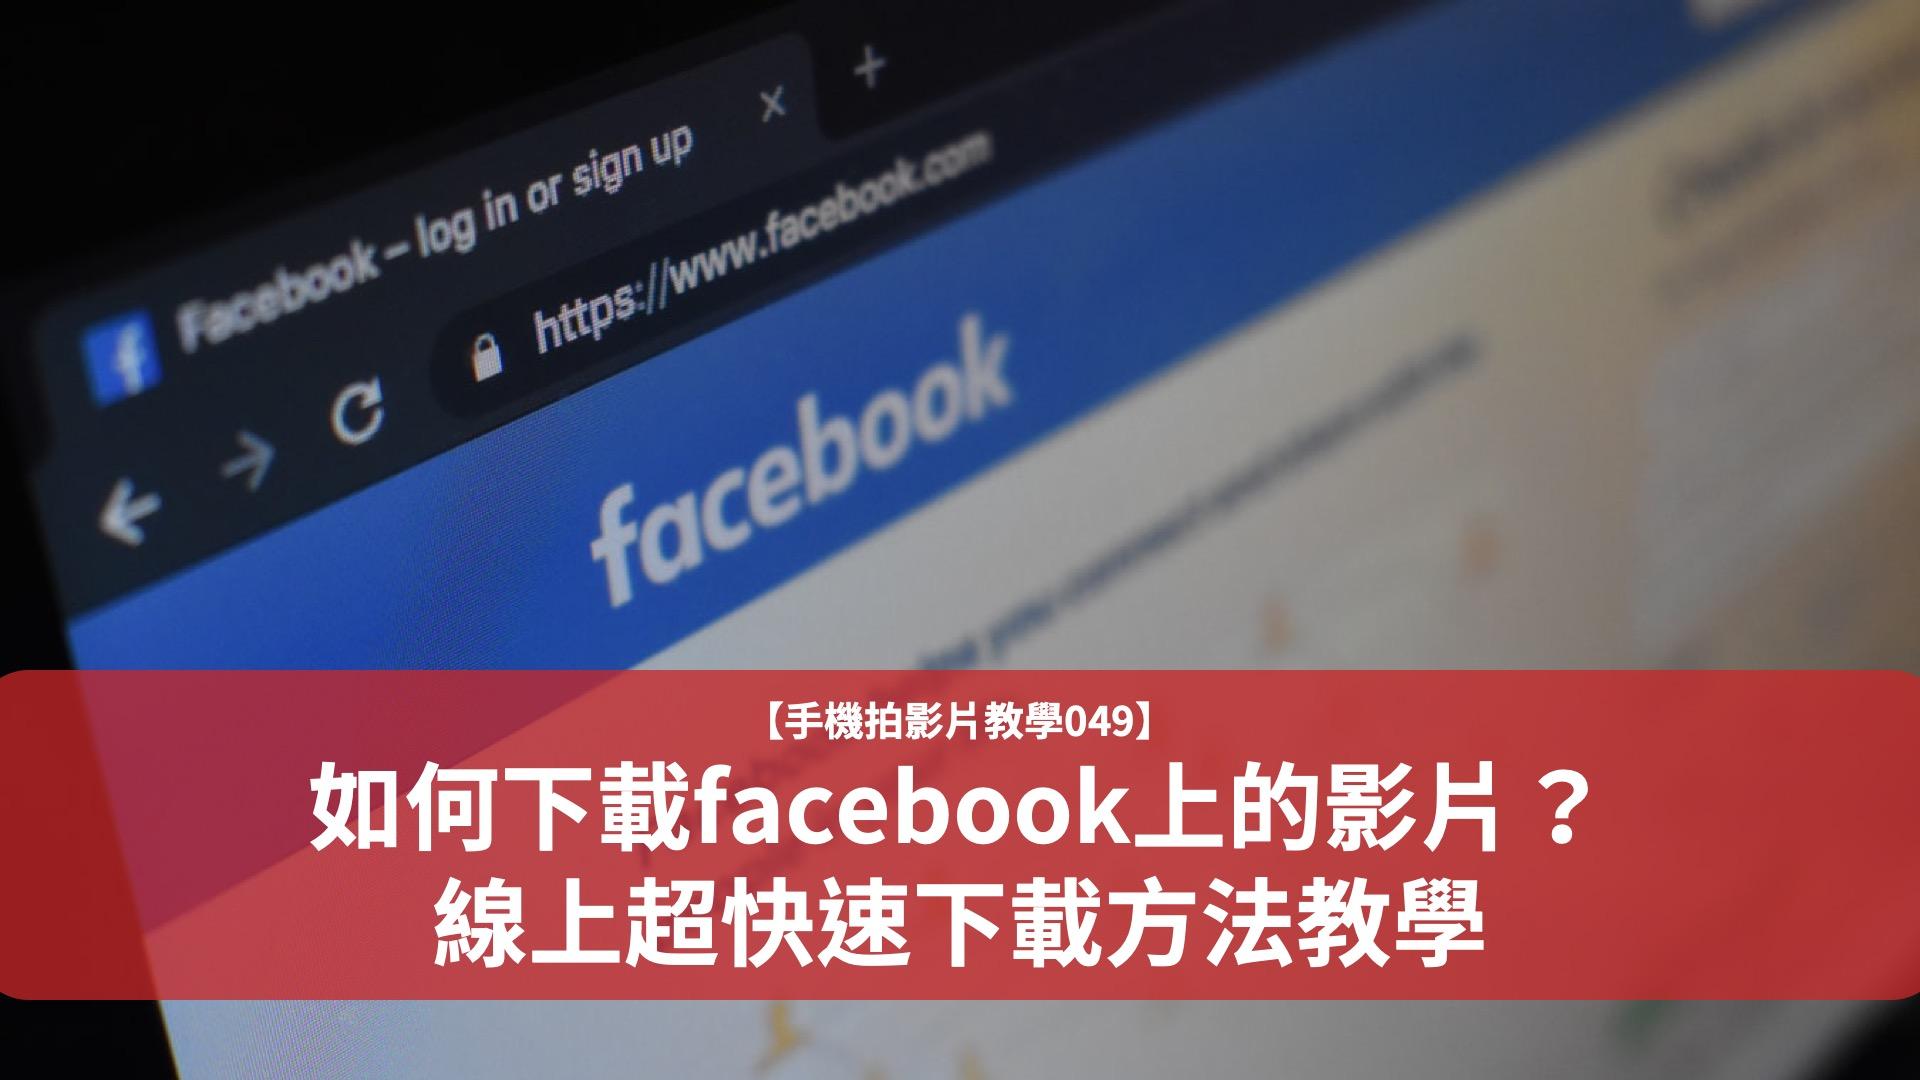 【fb影片下載教學】如何下載facebook上的影片?線上超快速下載方法教學 - 【燃燒吧!攝影魂】手機拍照攝影 ...